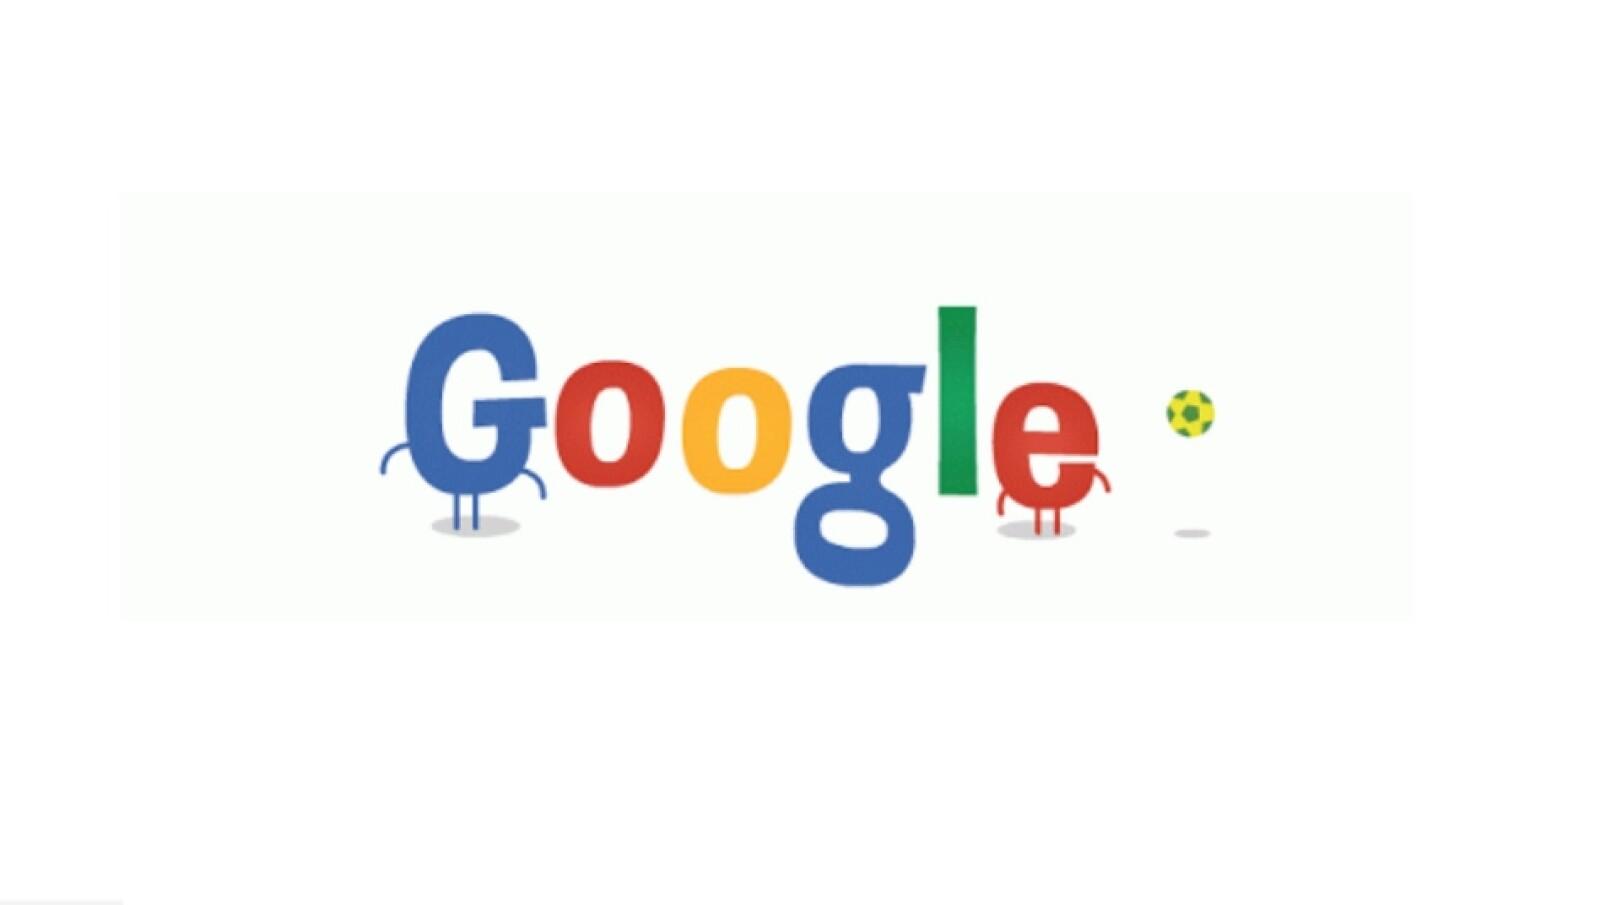 Google doodle 40